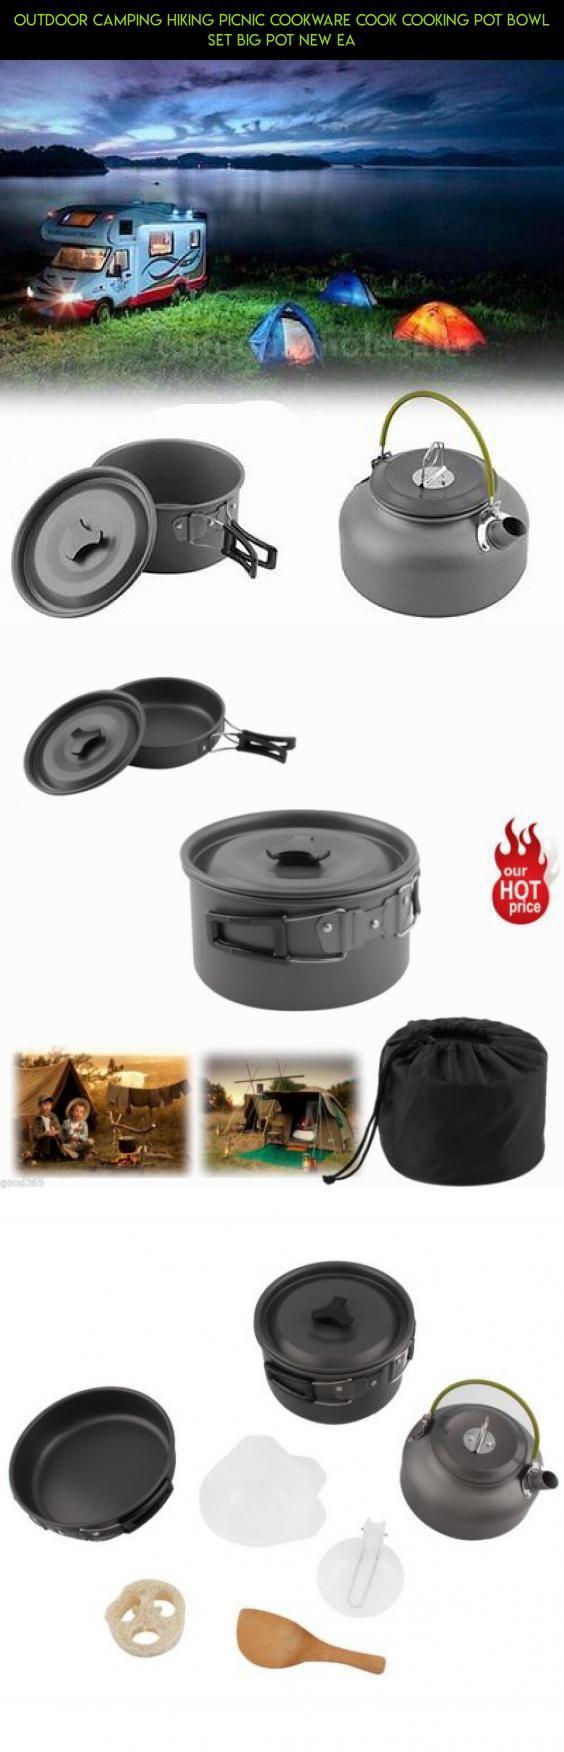 Outdoor camping hiking picnic cookware cook cooking pot bowl set big